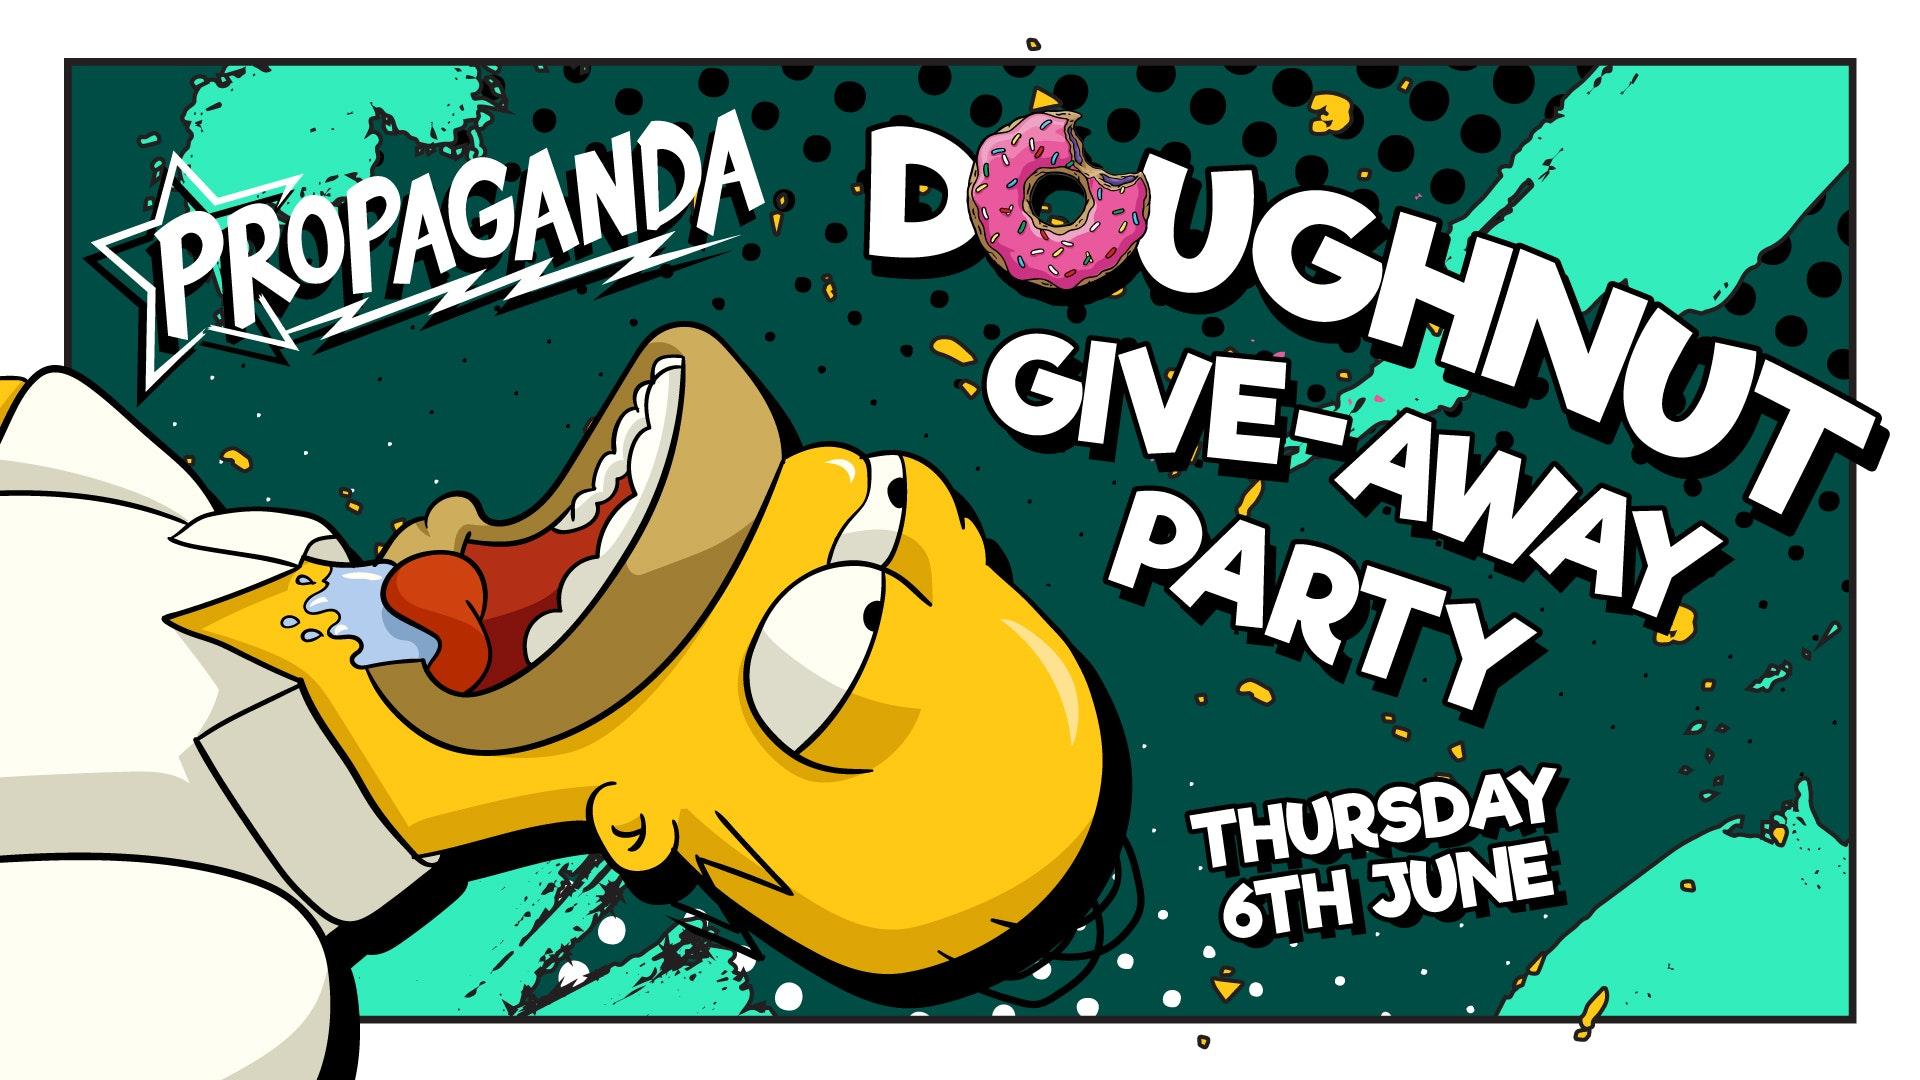 Propaganda Cheltenham – Doughnut Party